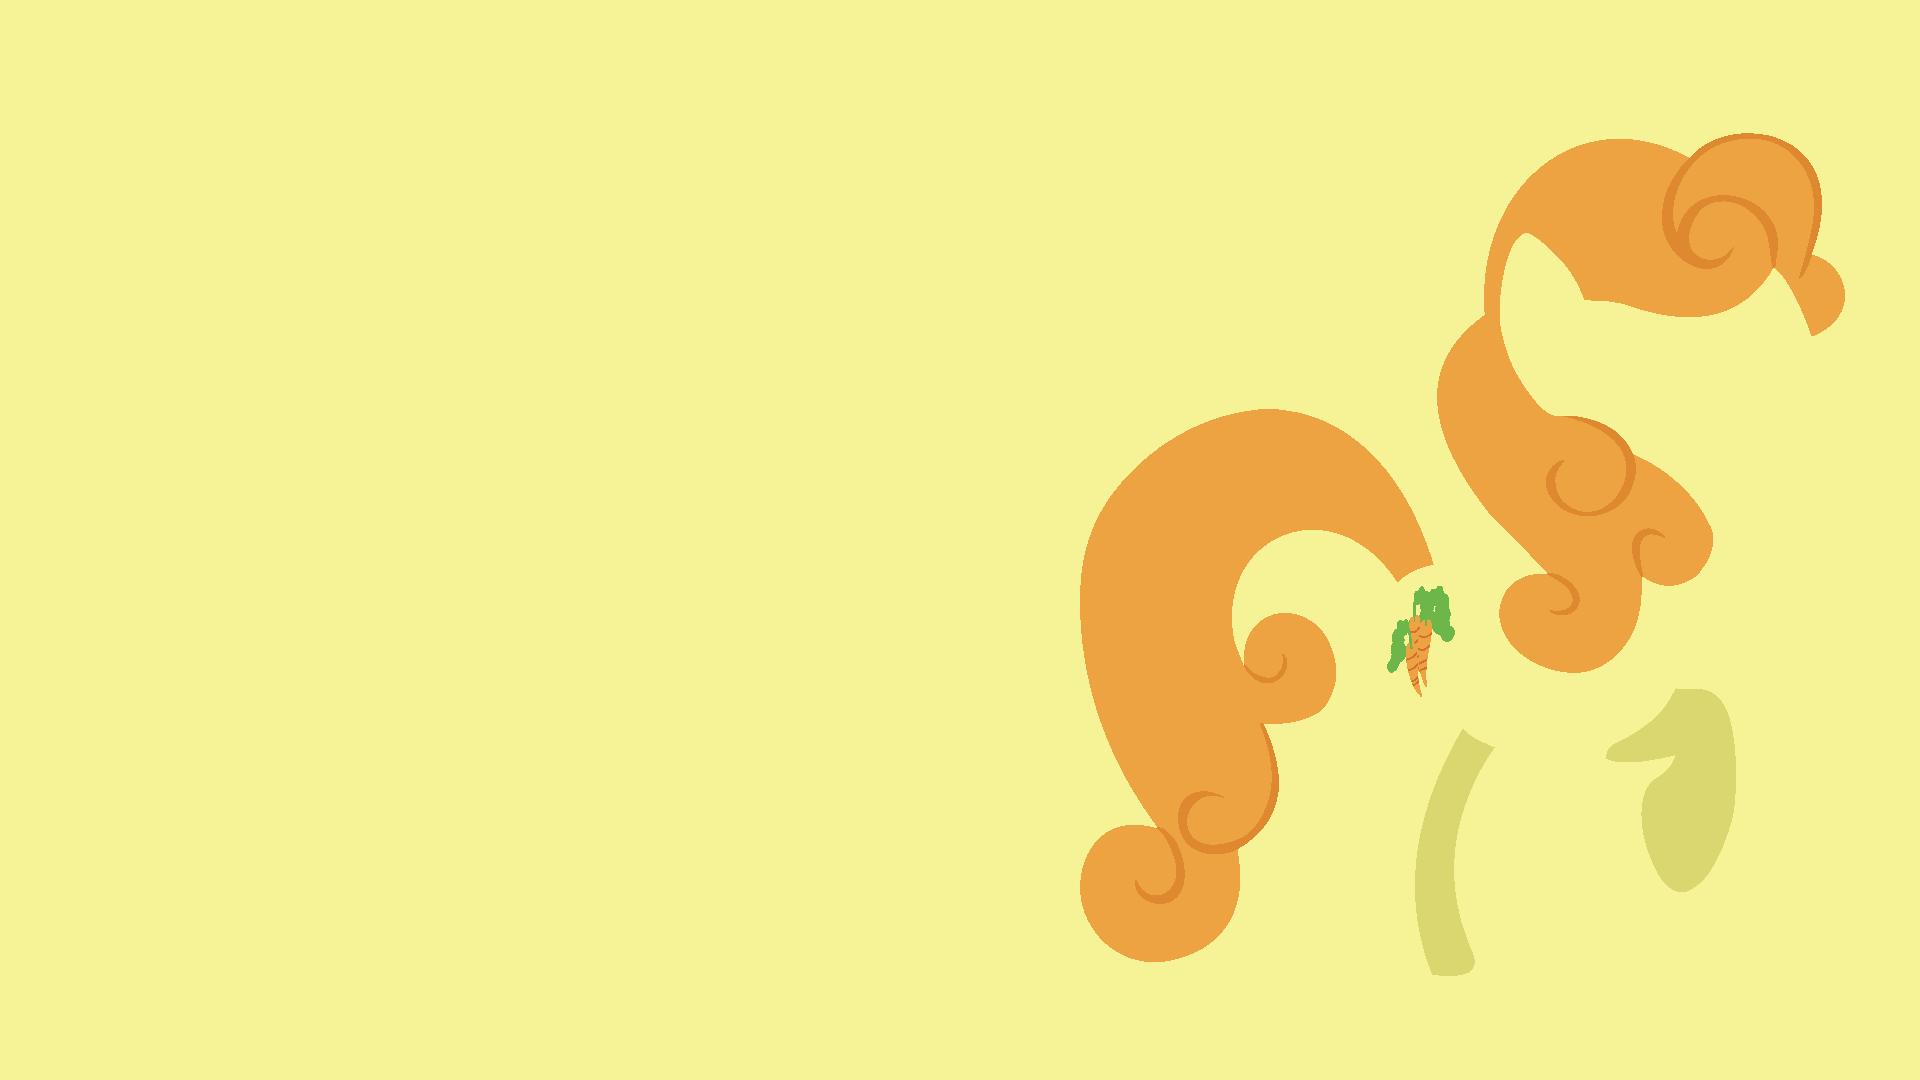 Carrot Top Minimalistic Wallpaper